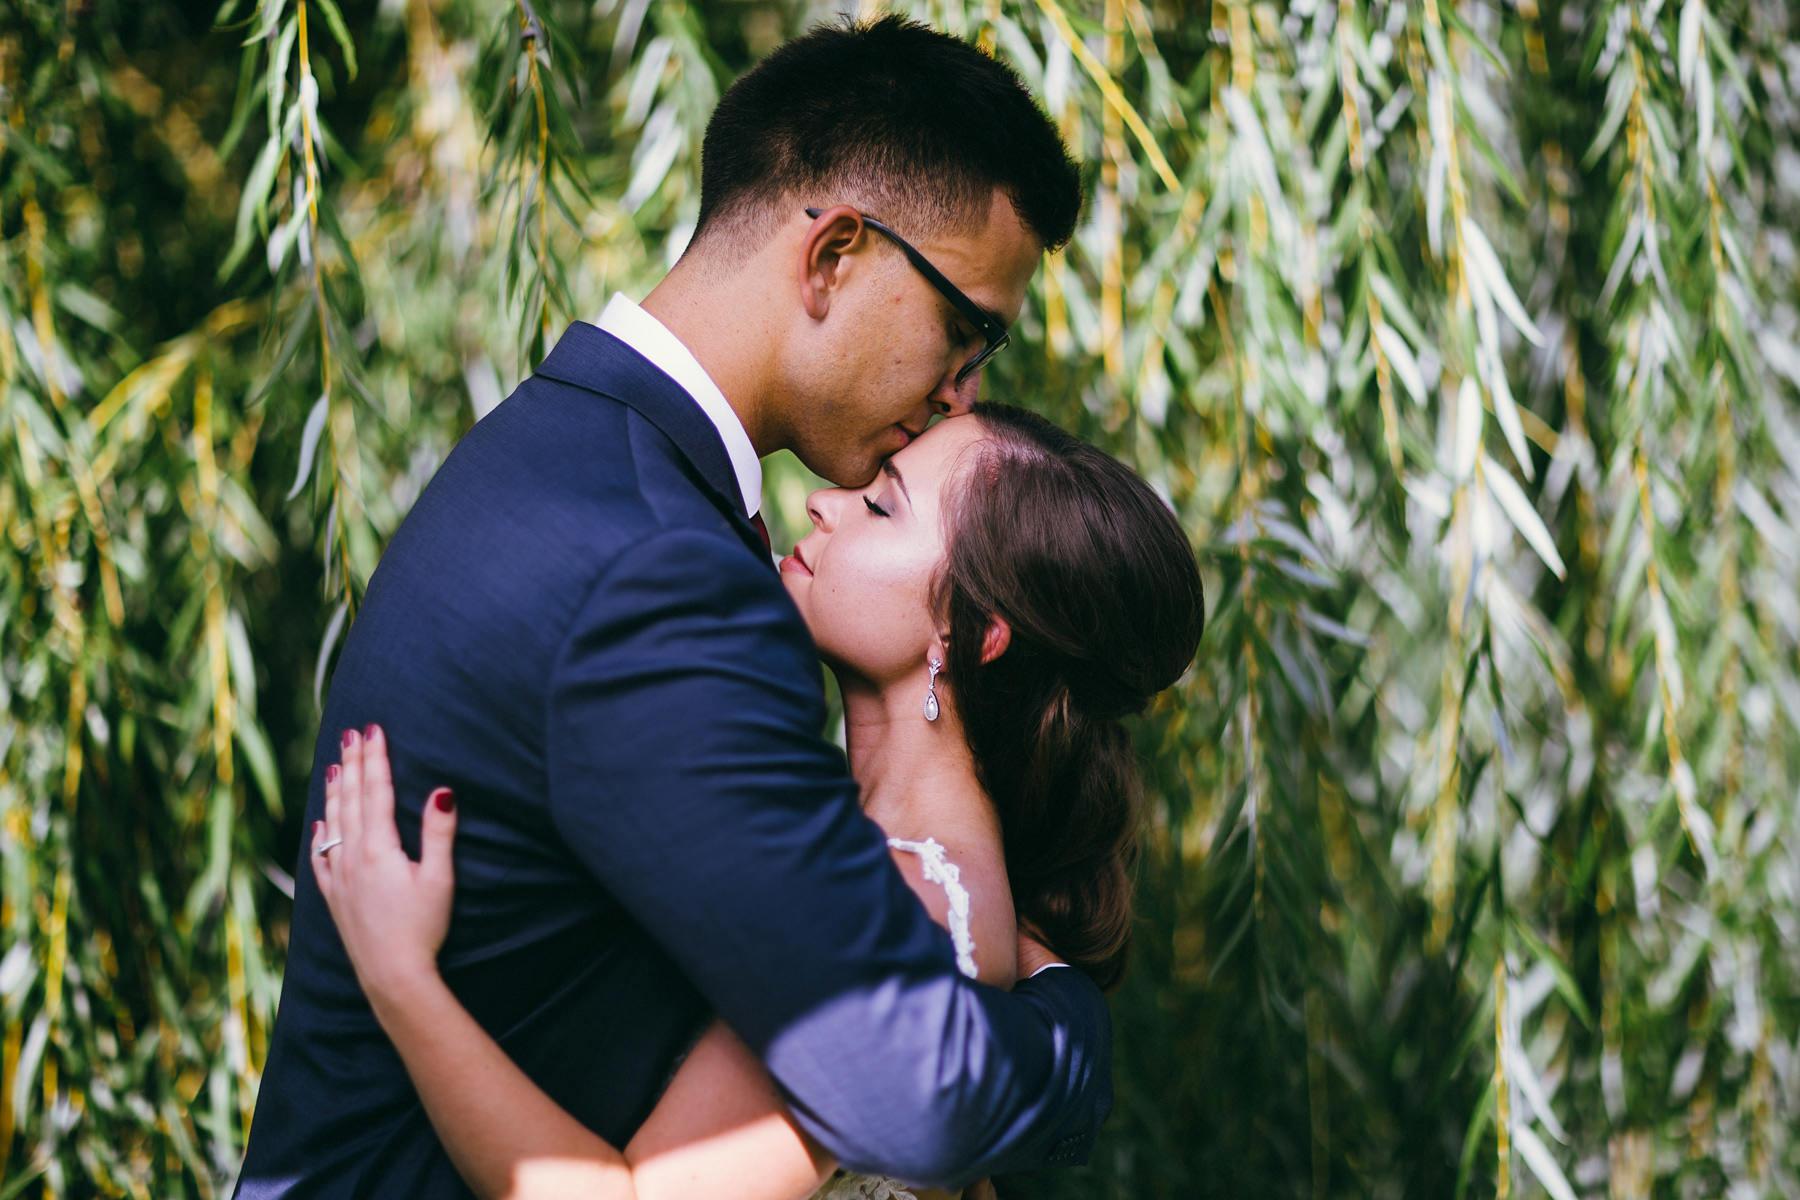 Kansas City Summer Wedding at the Guild_Kindling Wedding Photography Blog41.JPG